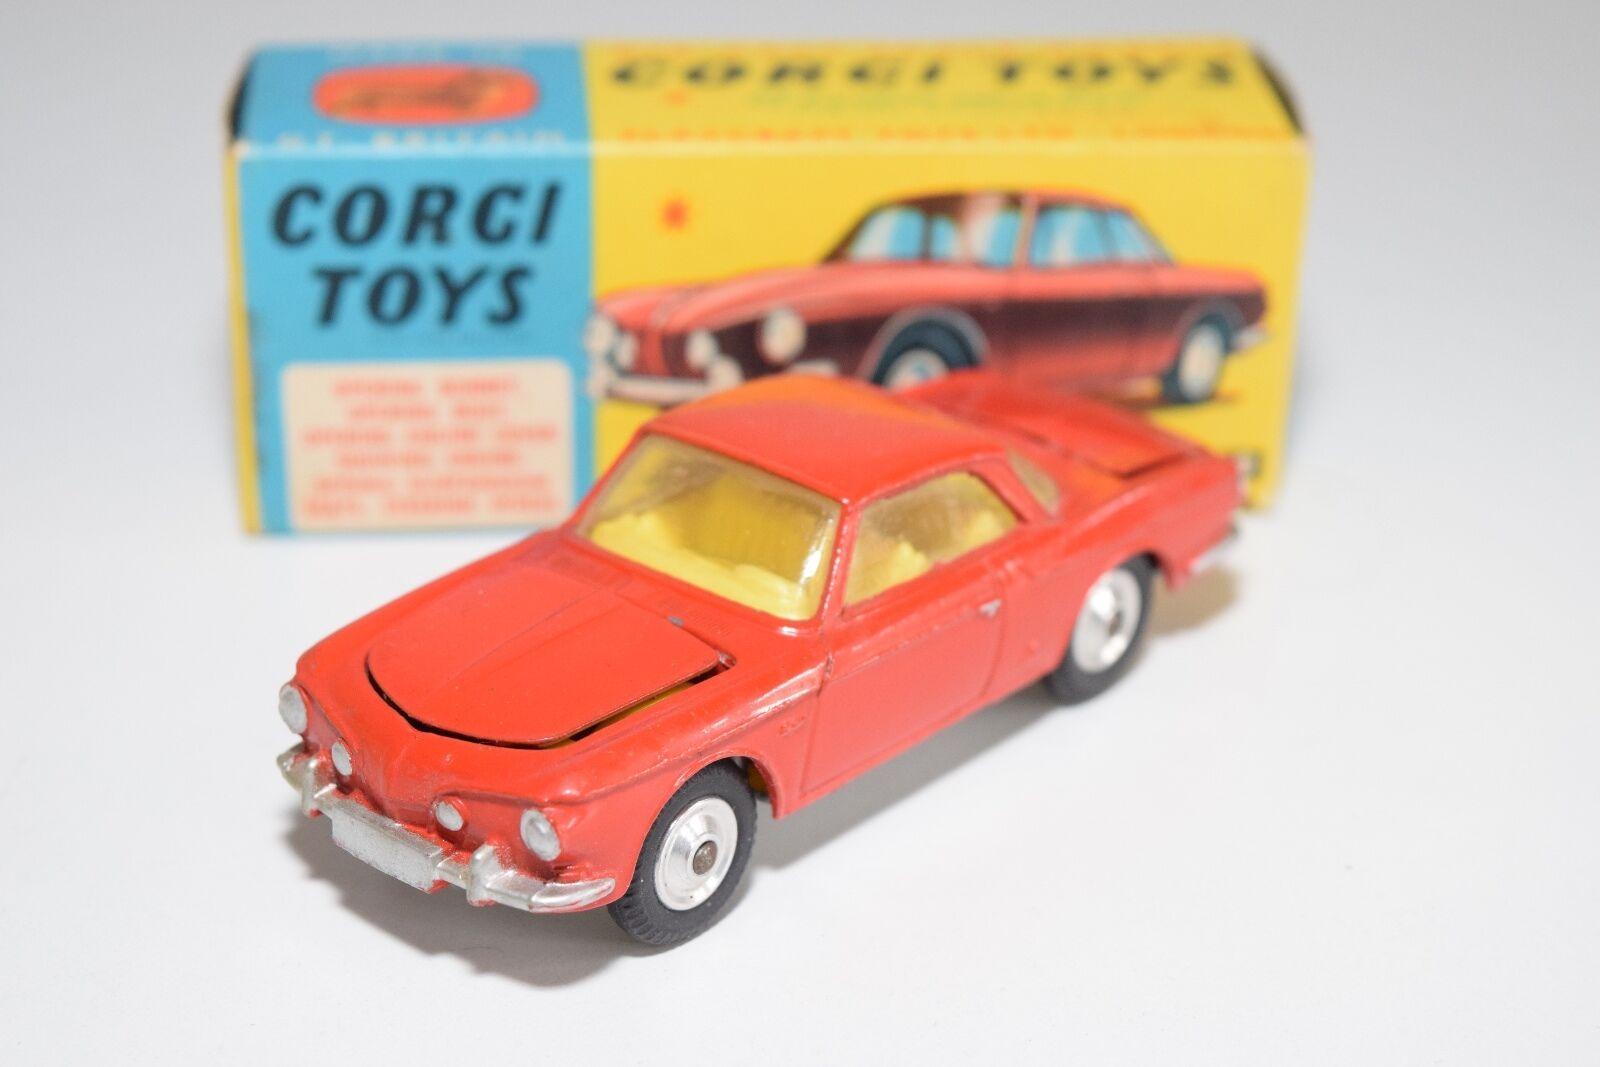 \\ CORGI TOYS 239 VW VOLKSWAGEN KARMANN GHIA 1500 rojo VERY NEAR MINT BOXED